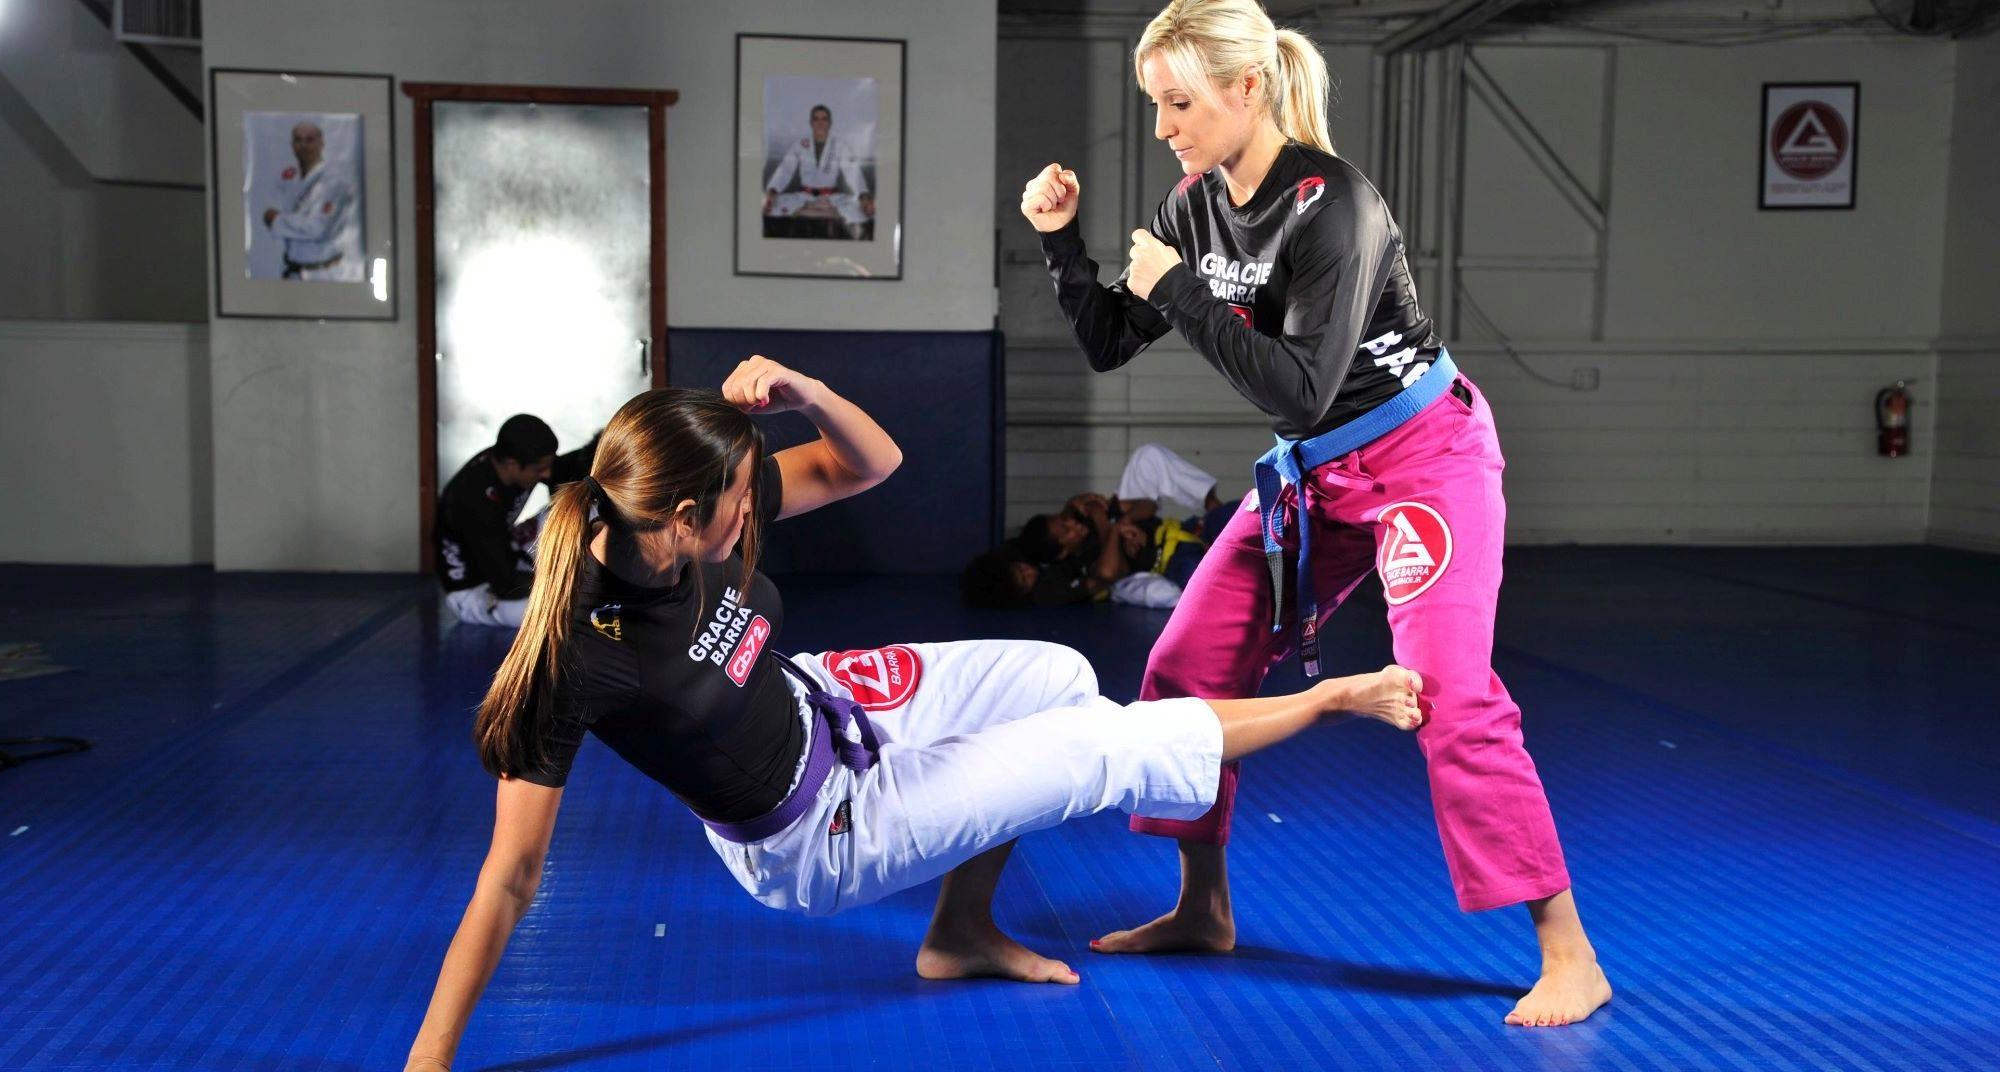 Two students spar at Gracie Barra Brazilian Jiu-Jitsu in Ahwatukee